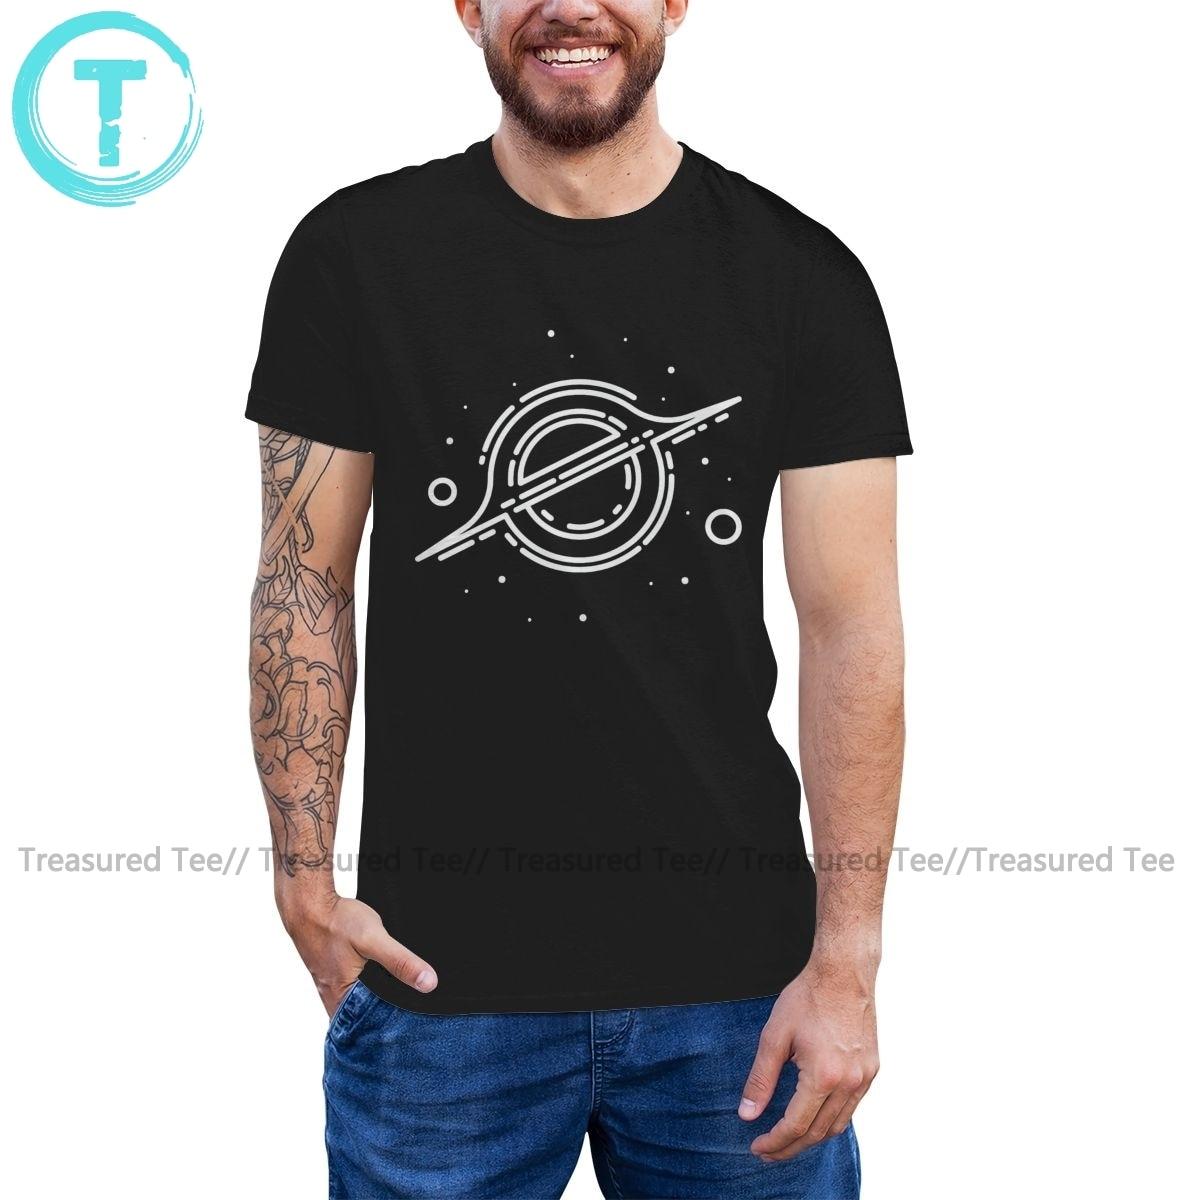 Interstellar T Shirt Gargantua T-Shirt Short-Sleeve Casual Tee Shirt XXX Funny Cotton Men Graphic Tshirt illuminati t shirt fashion brand dont trust anyone graphic tee letter print men t shirt casual funny shirt lw